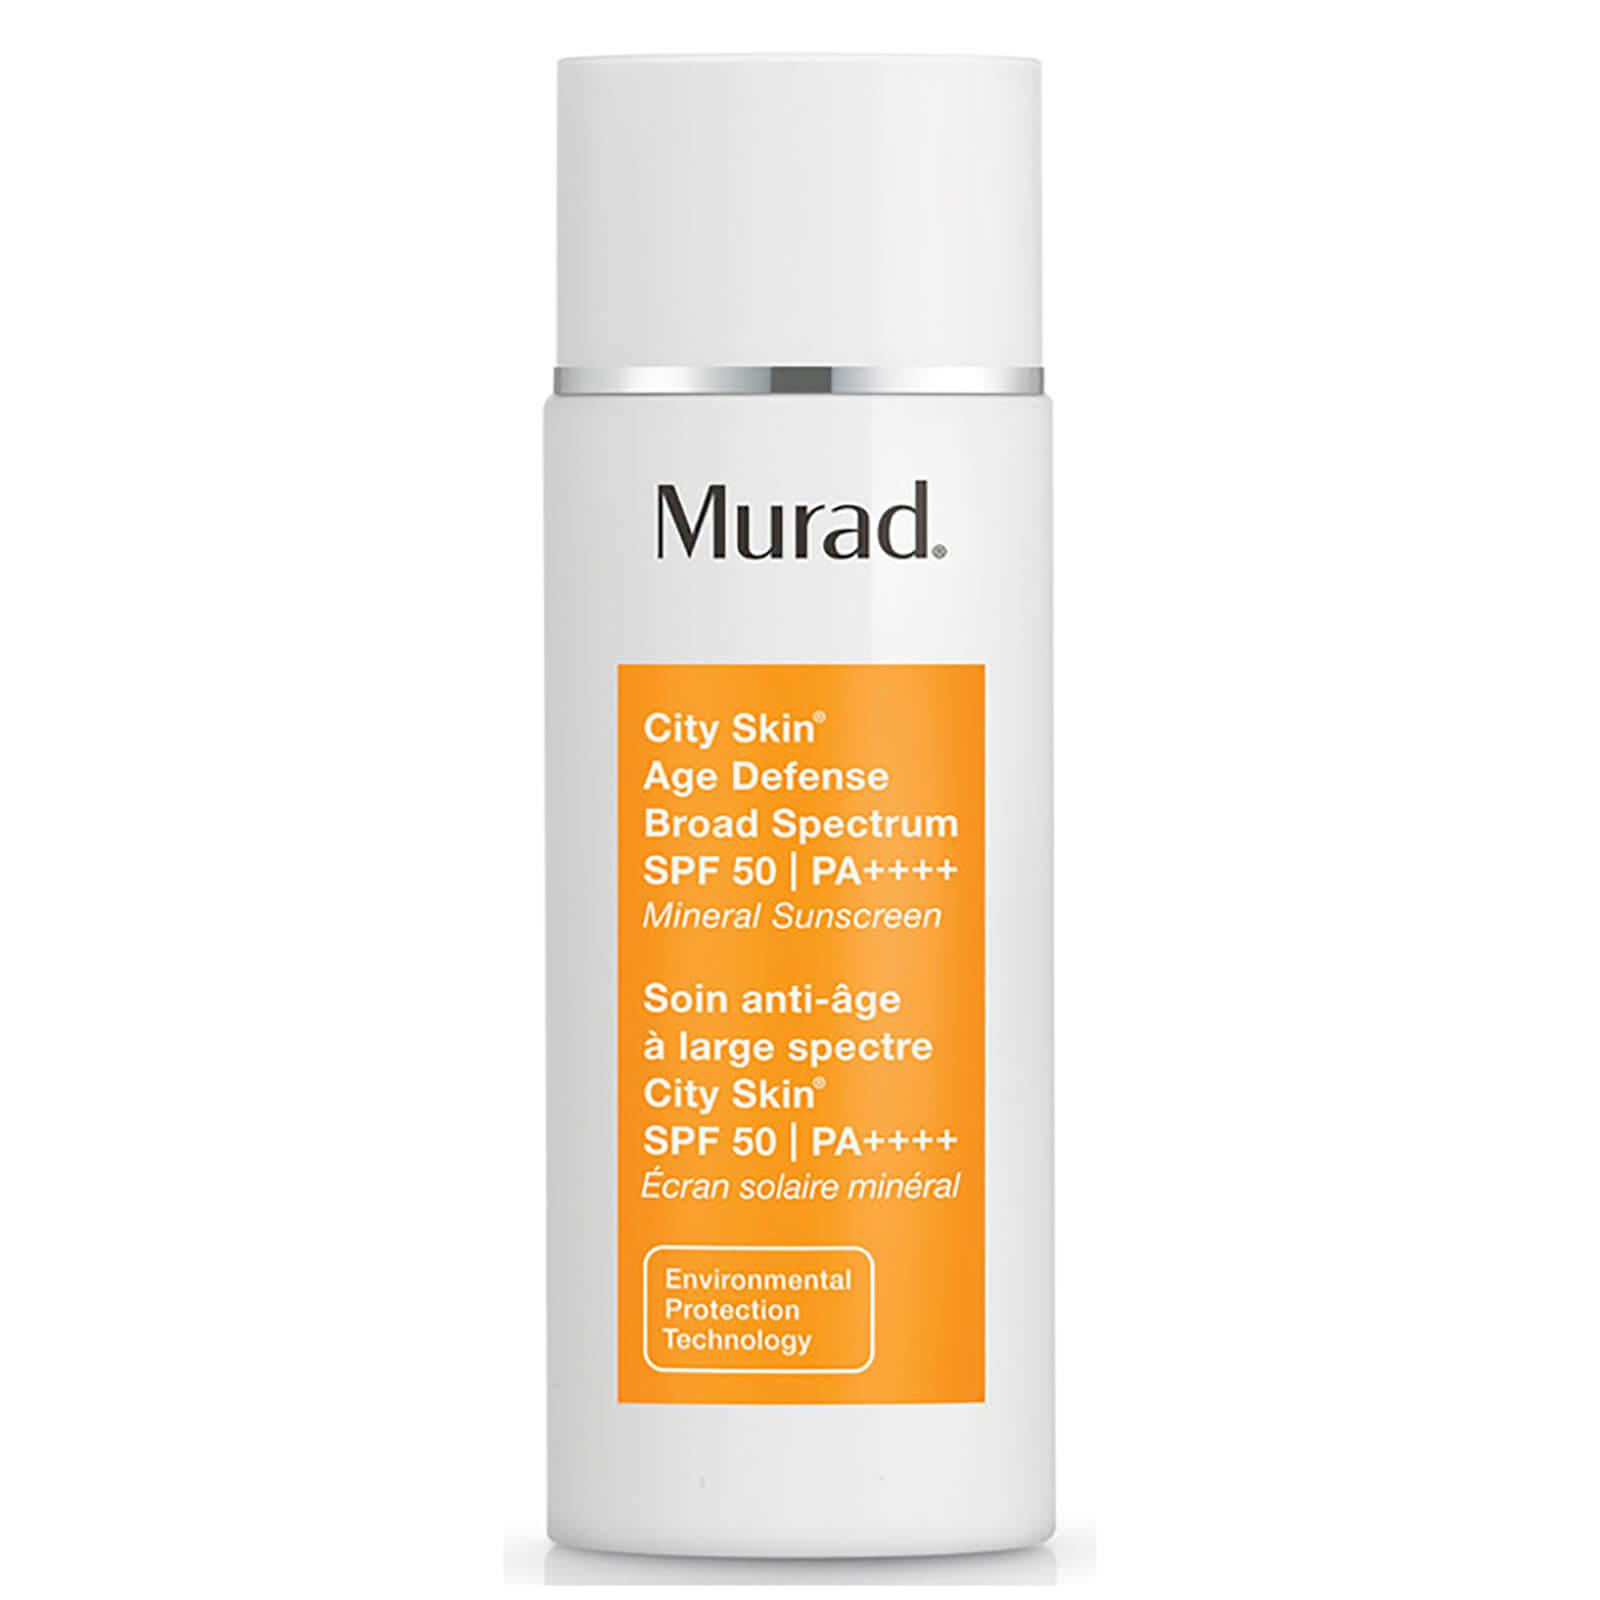 My Celebrity Life – Murad City Skin Age Defense Broad Spectrum SPF 50